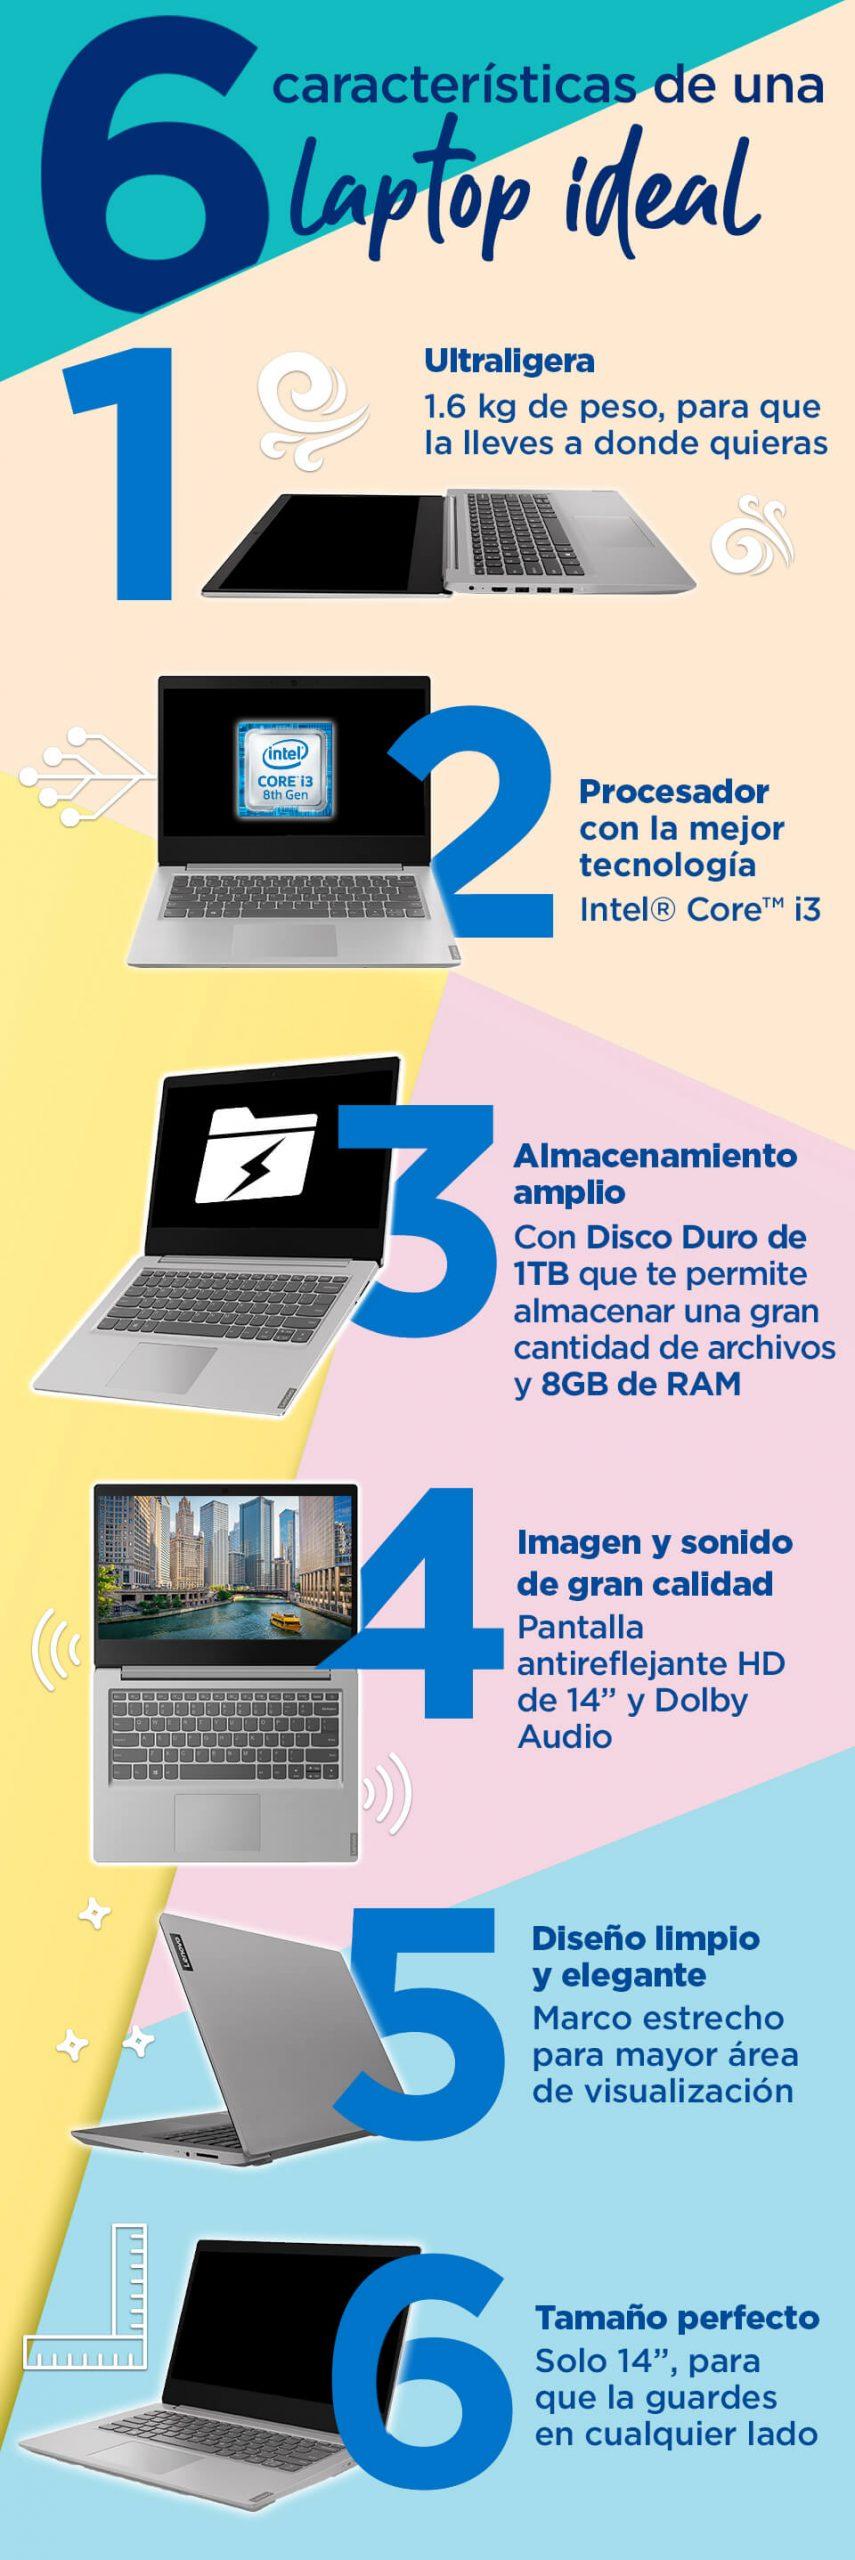 6 características de una laptop ideal